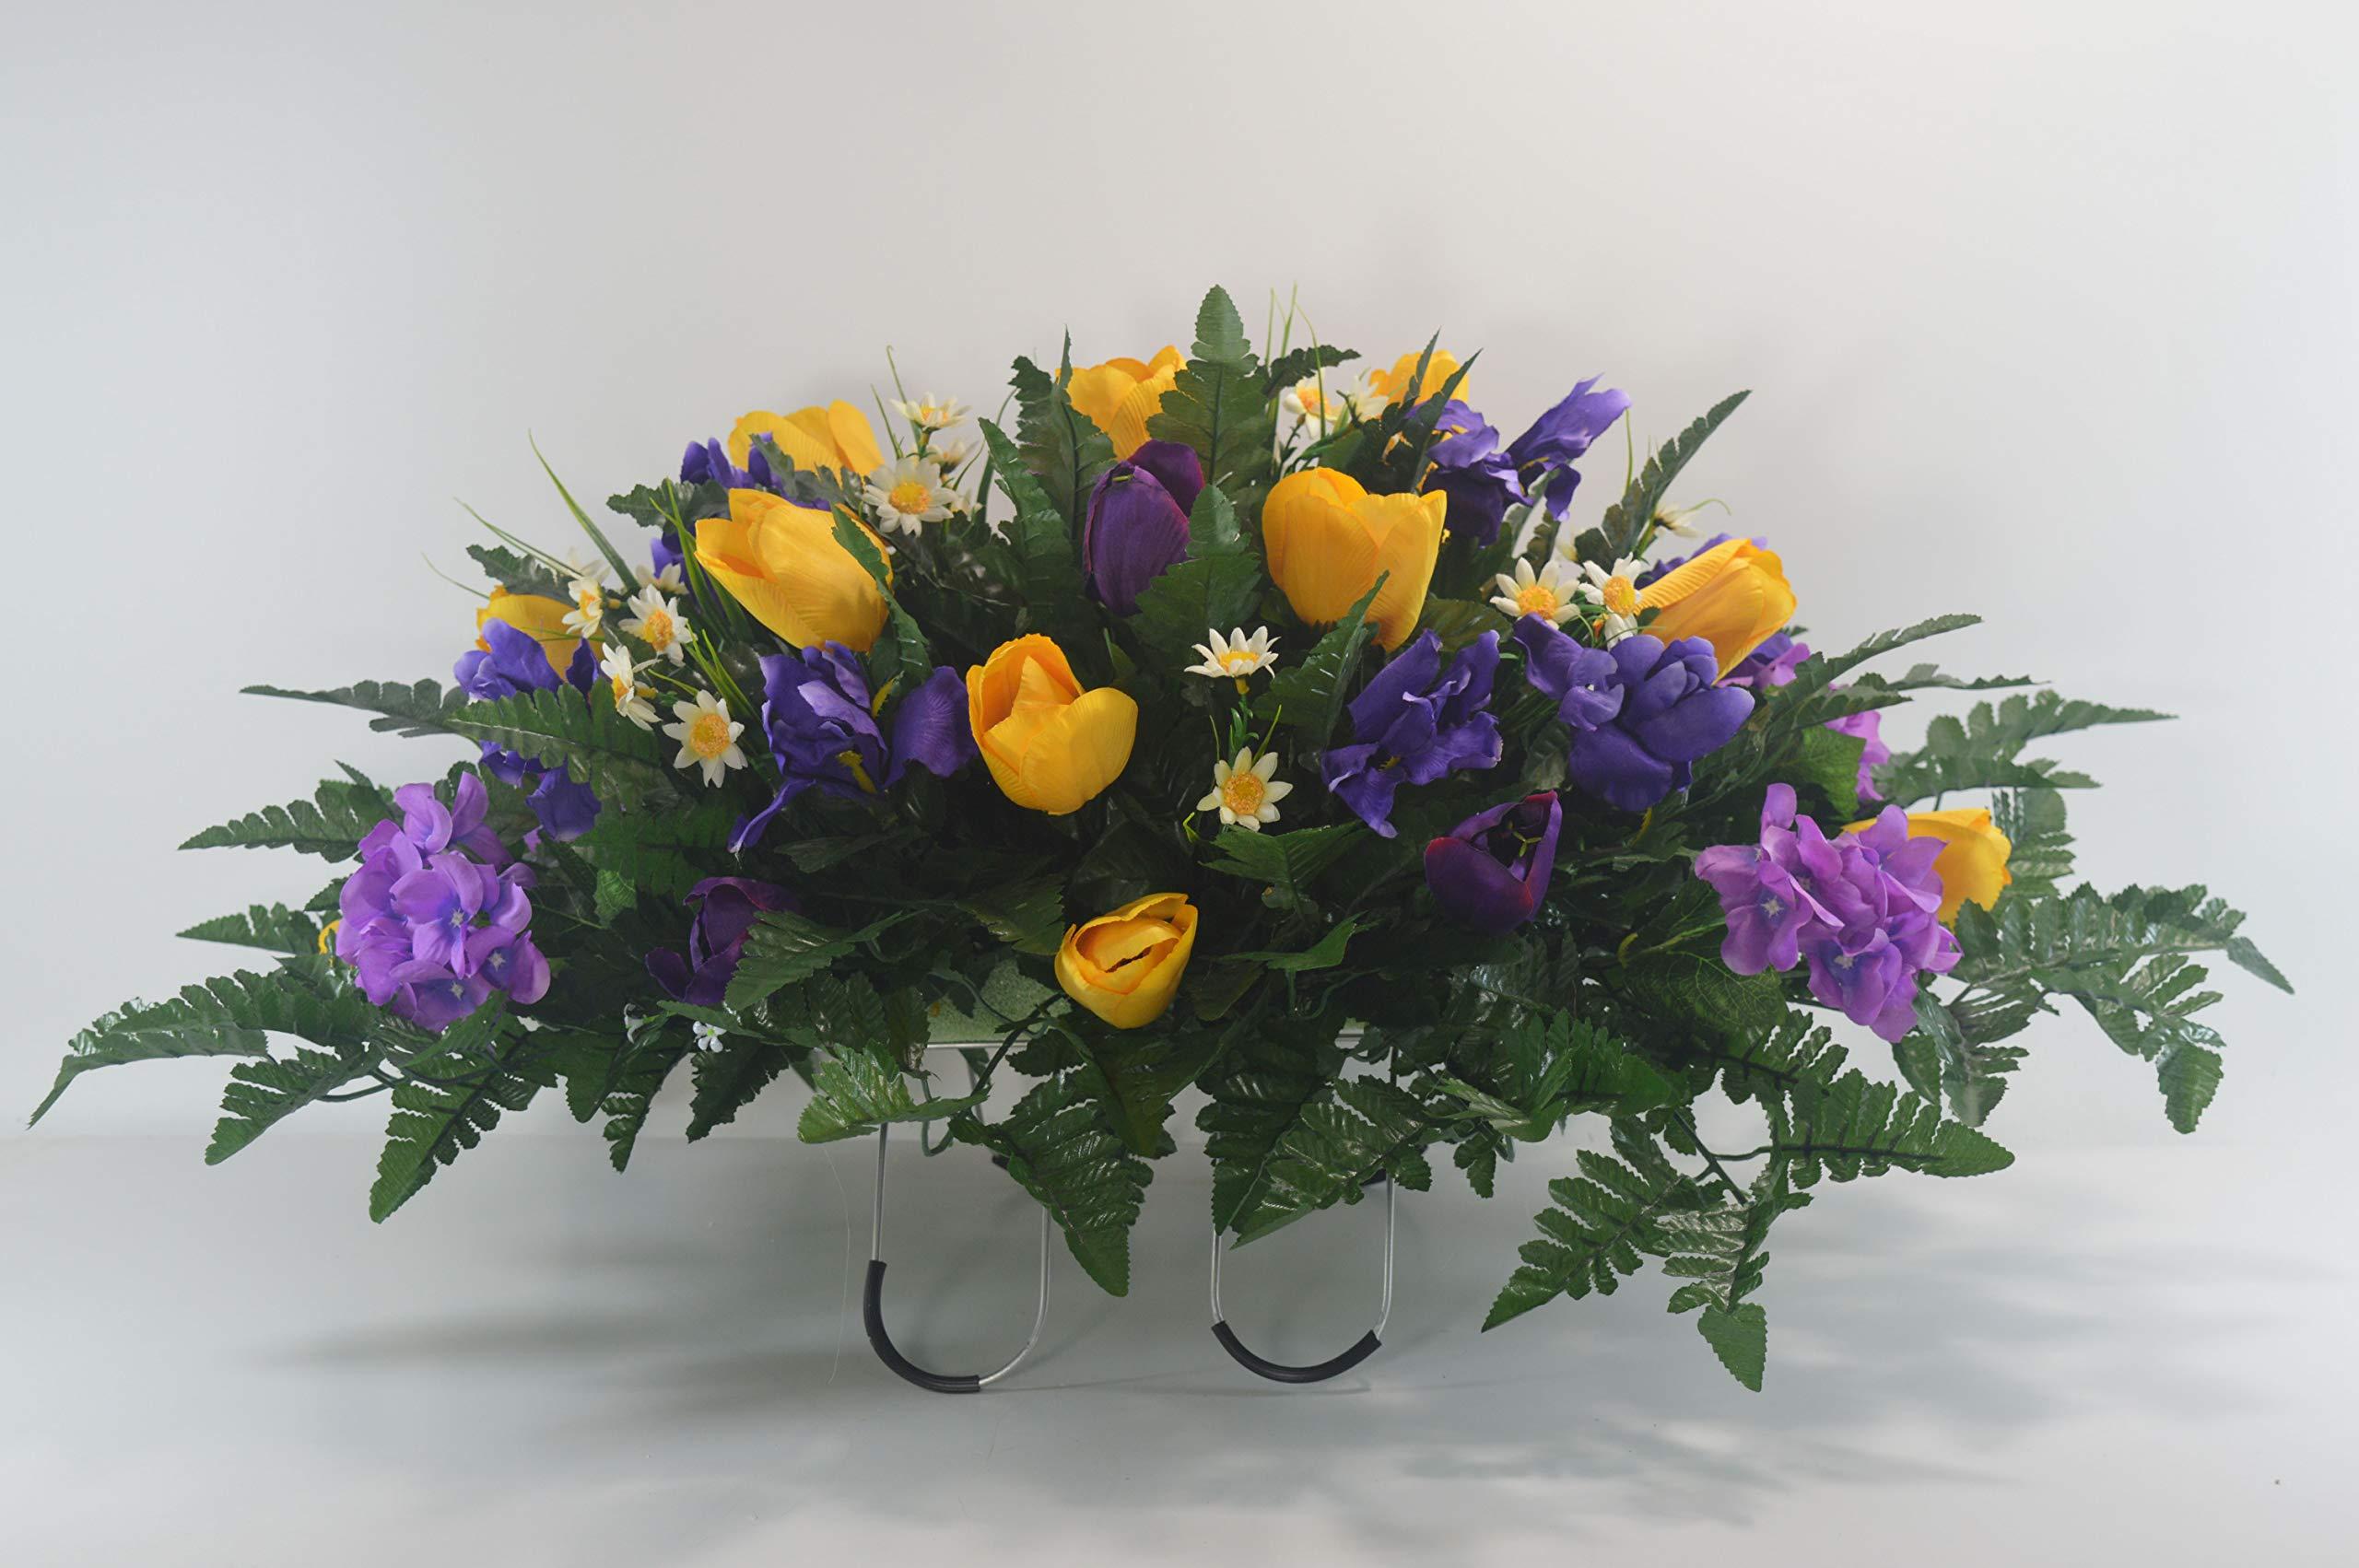 R52-Spring-Cemetery-Flower-Arrangement-Easter-Saddle-Headstone-Saddle-Grave-Tombstone-Arrangement-Cemetery-Flowers